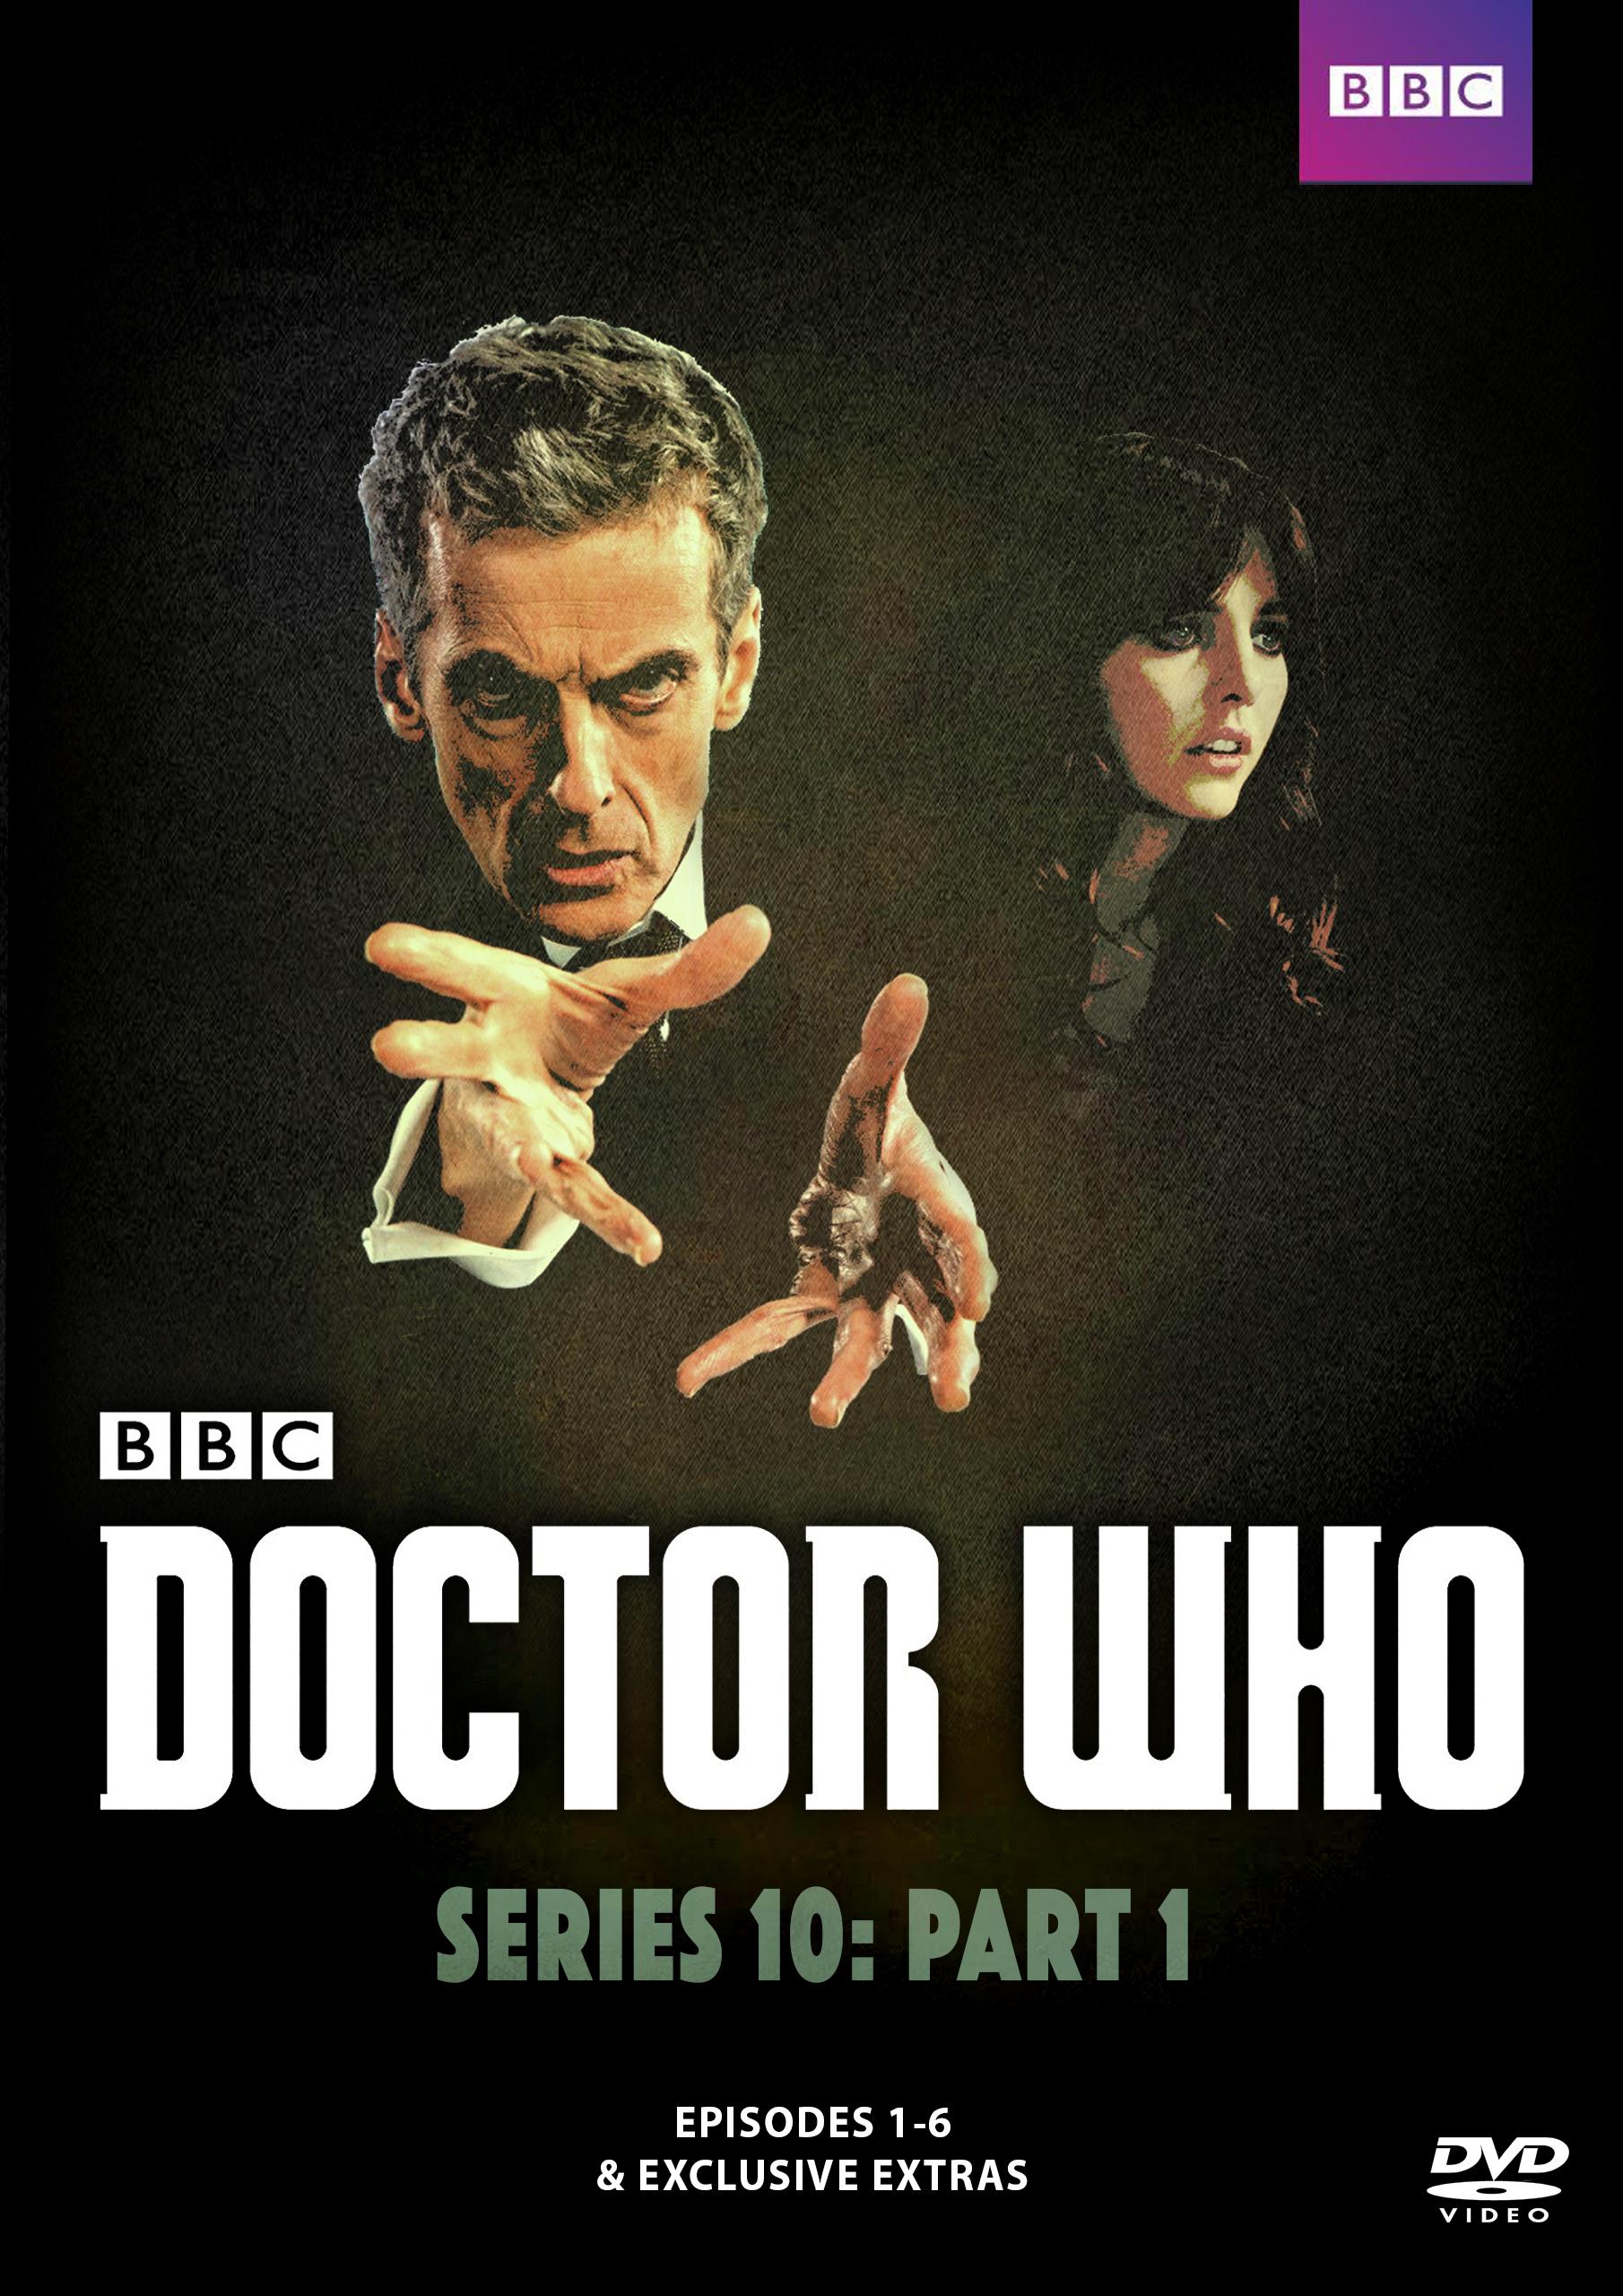 doctor_who_series_10___fanon_series_dvd_